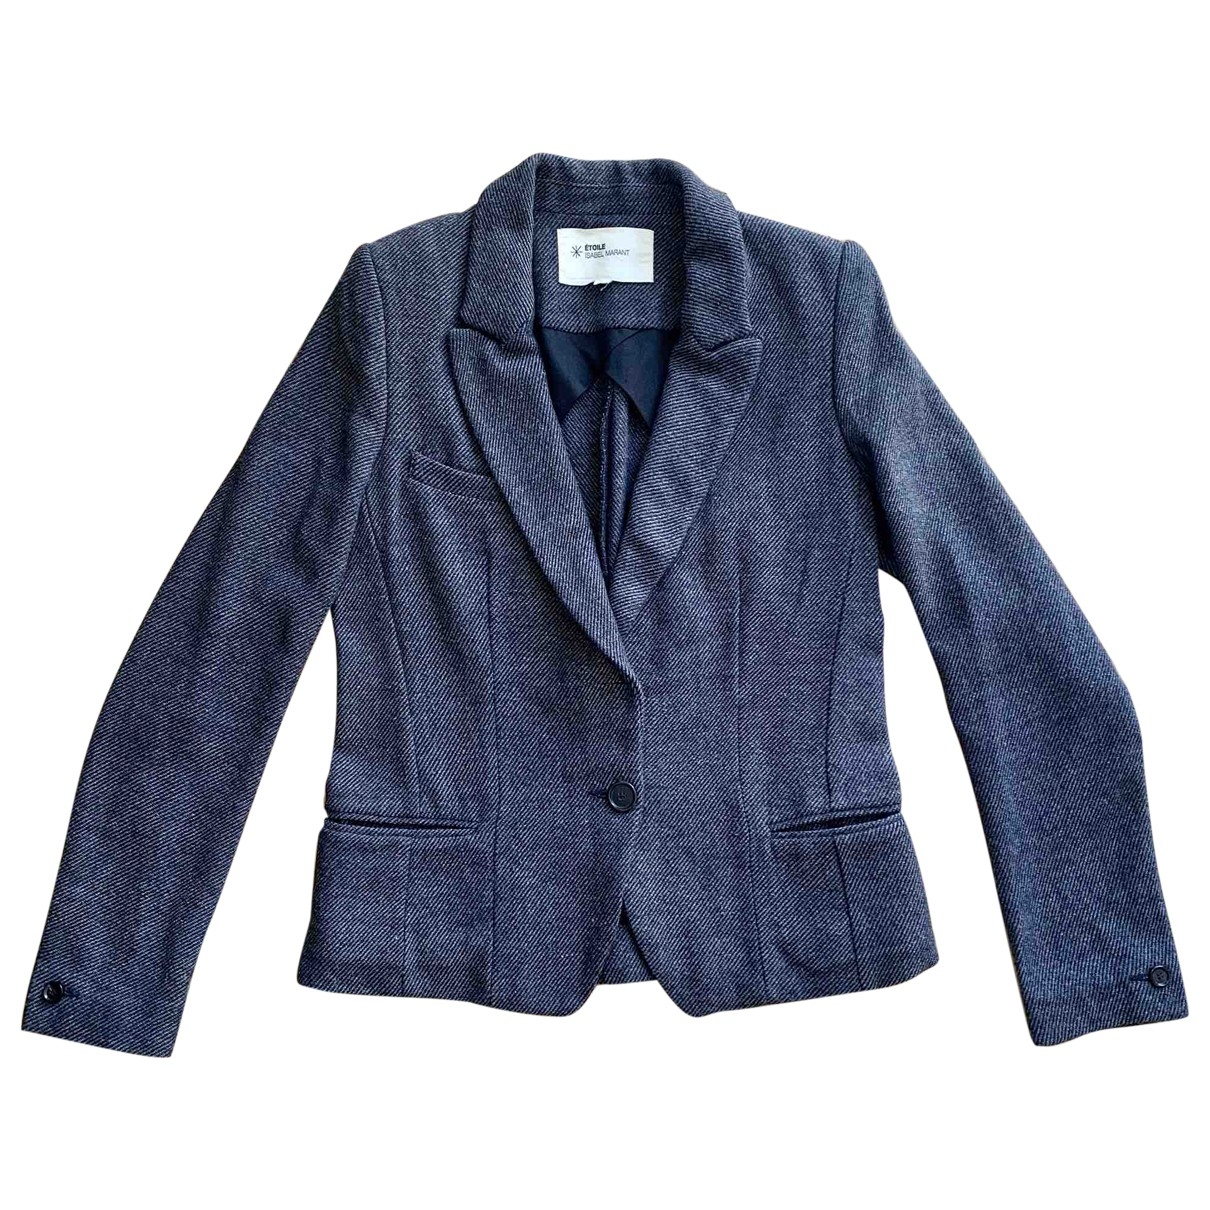 Isabel Marant Etoile \N Anthracite Wool jacket for Women 38 FR